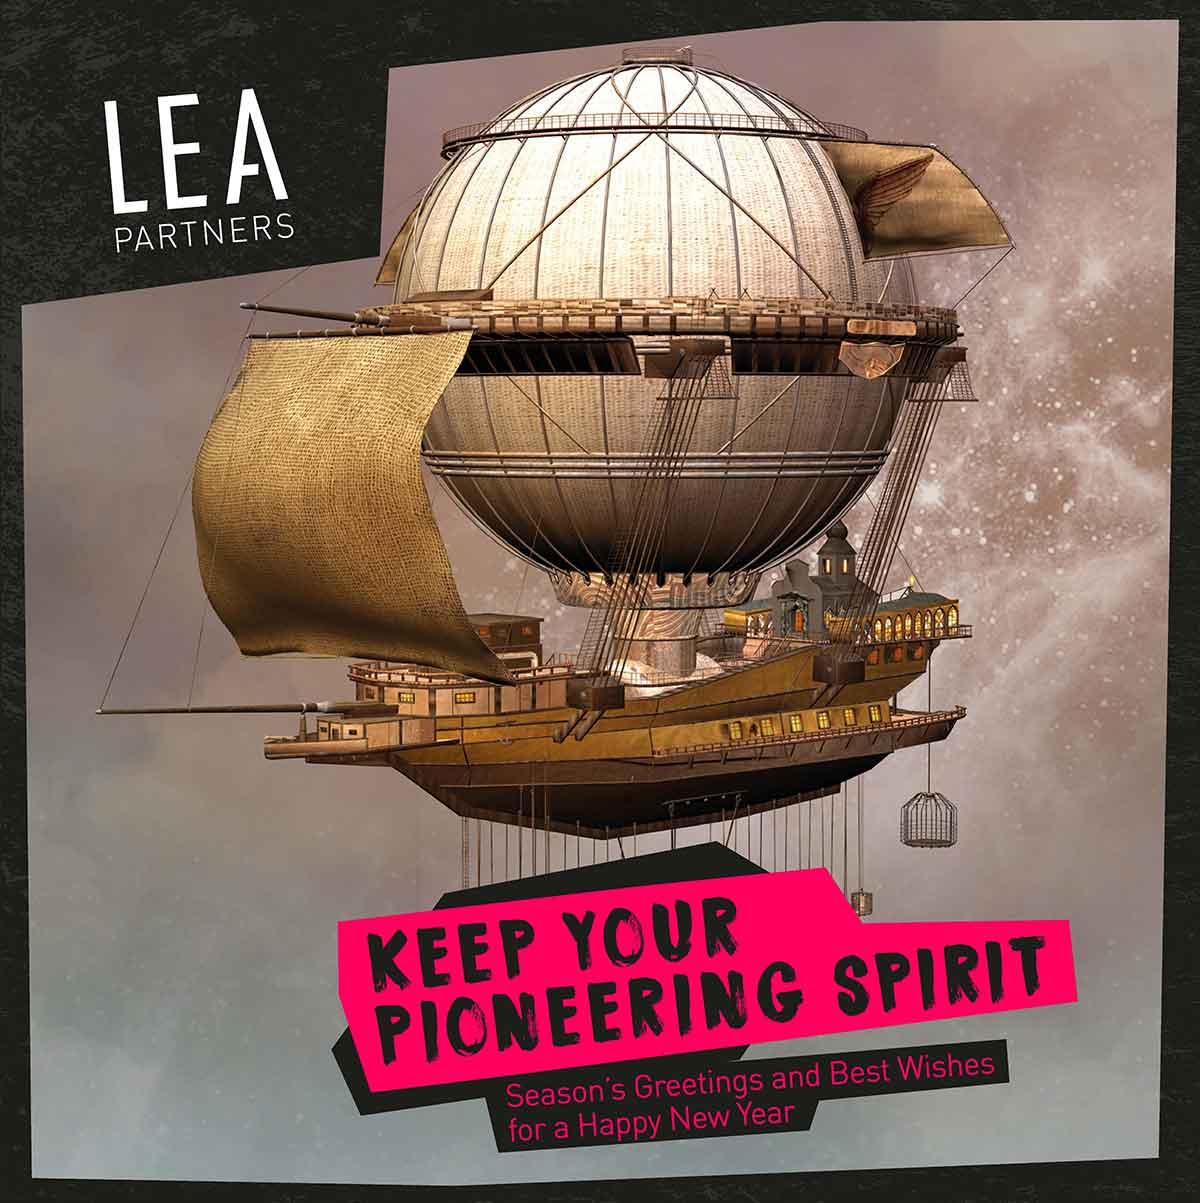 LEA Partners Xmas Cards